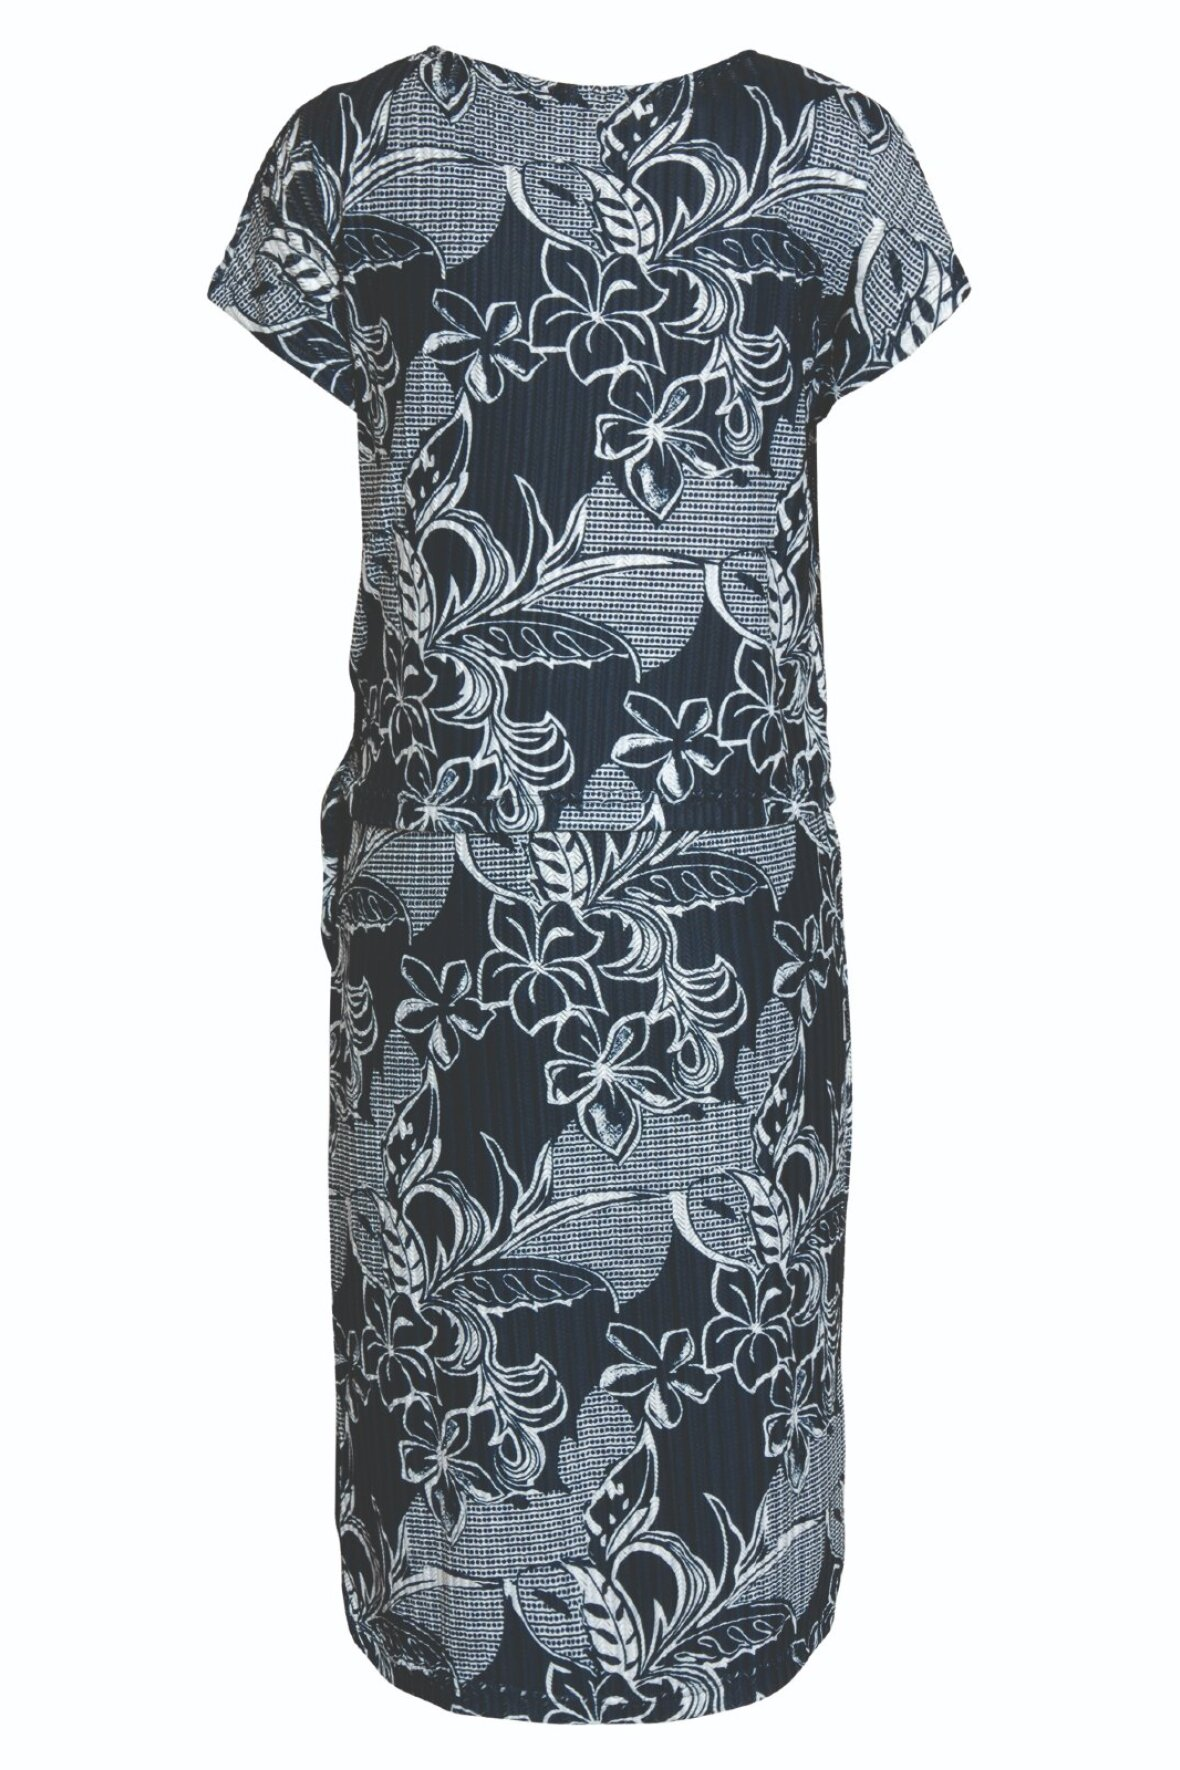 4d6a6974f Brandtex Classic kjole med fast underkjole og bluse i marineblå ...